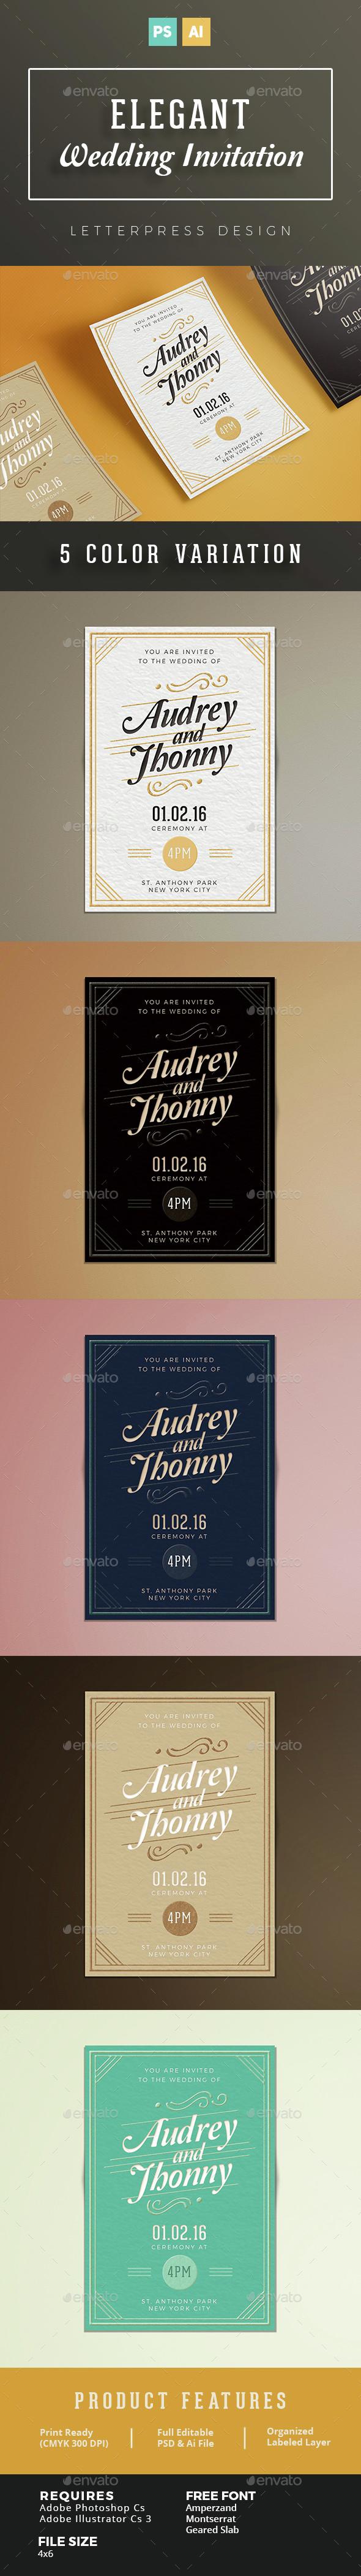 Elegant Wedding Invitation - Cards & Invites Print Templates